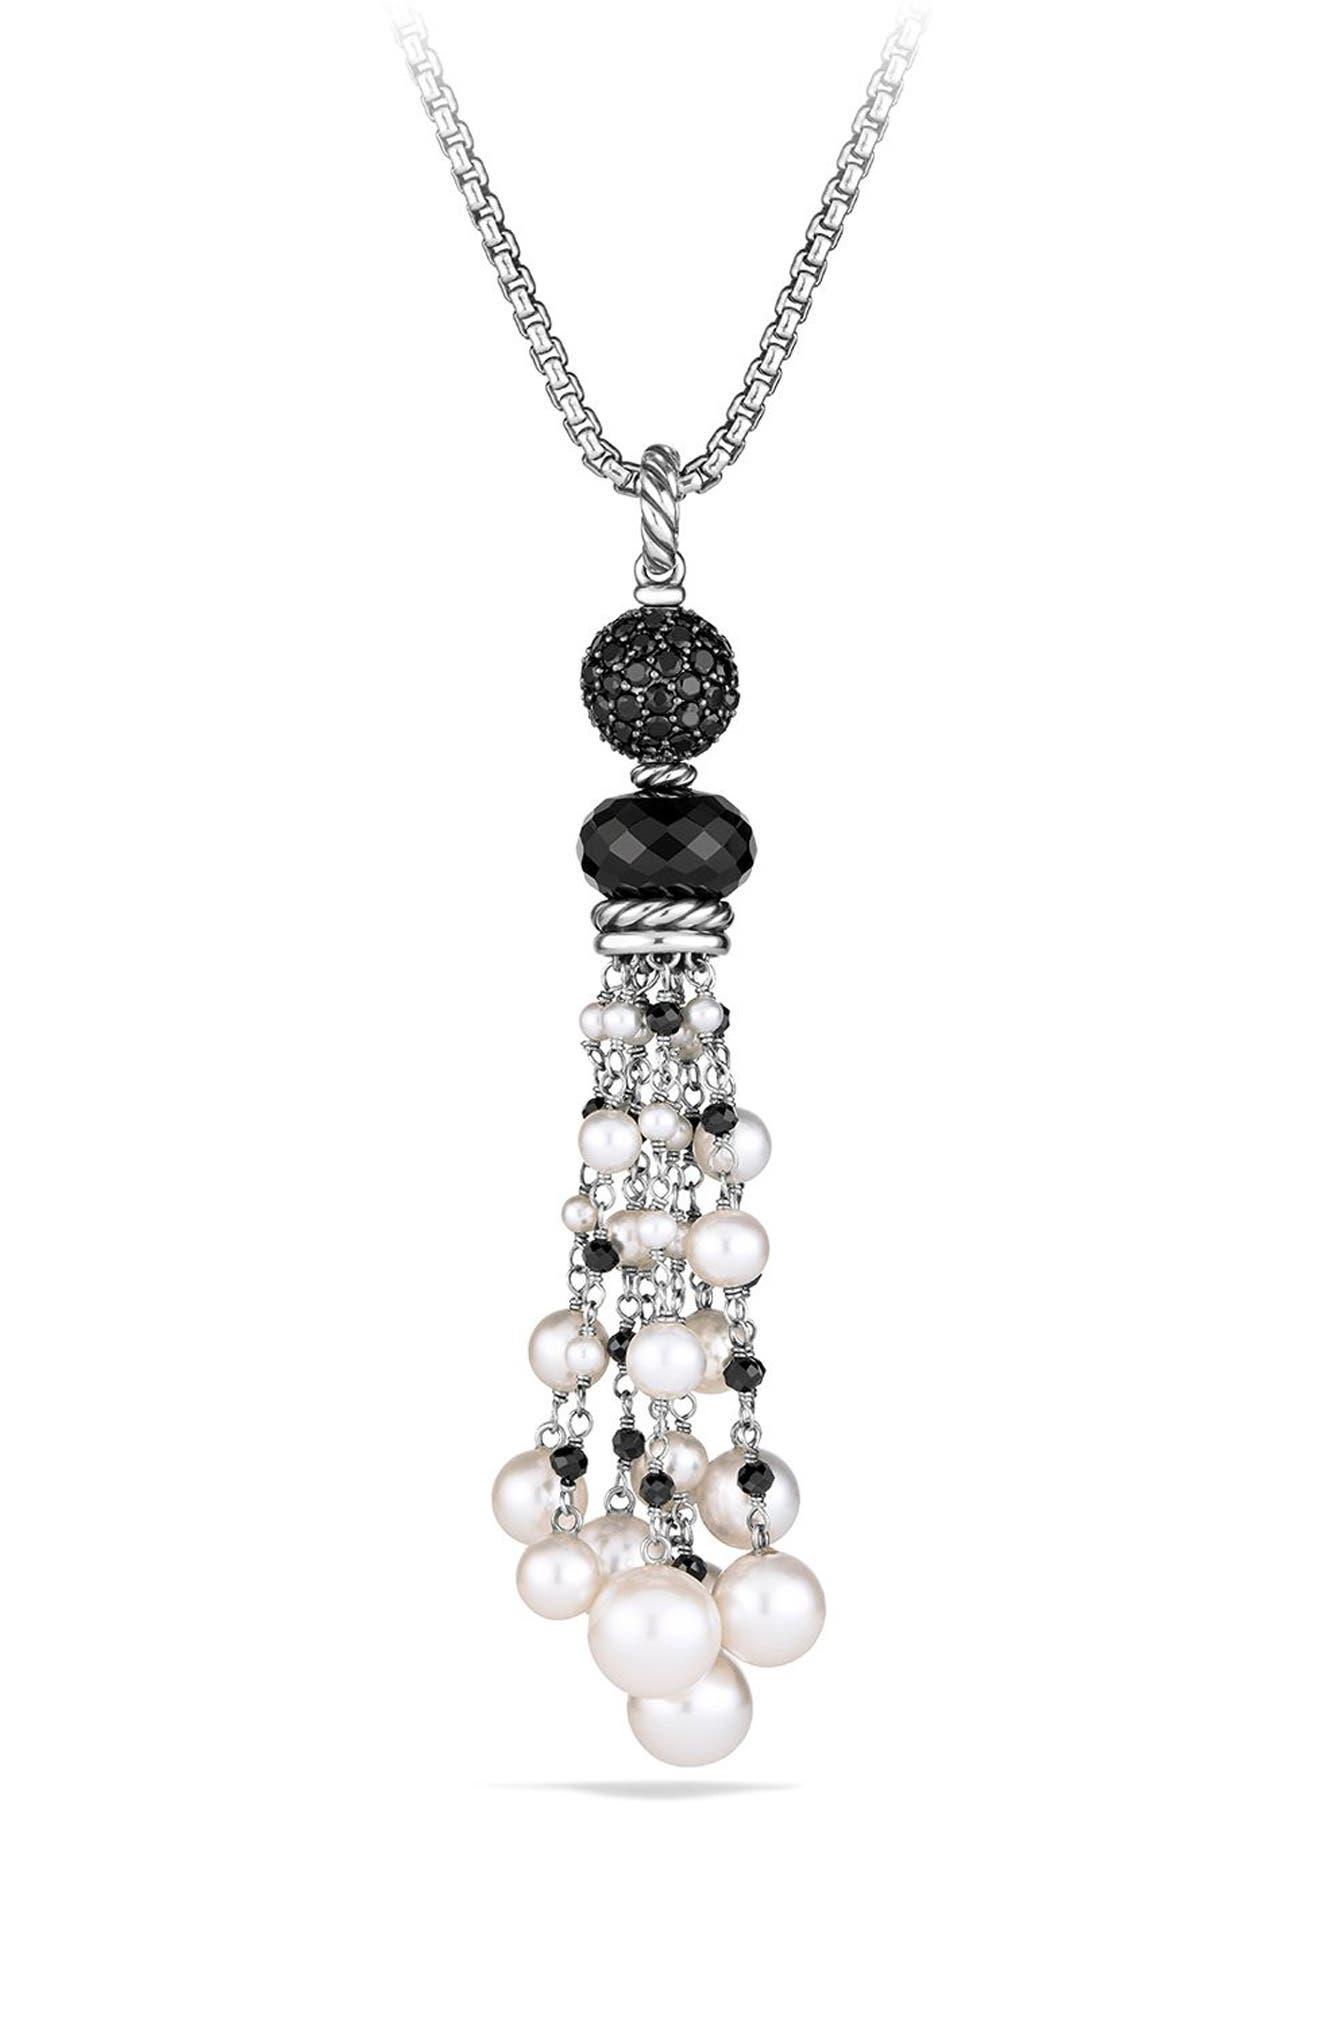 David Yurman Oceanica Tassel Pendant with Black Onyx and Pearl